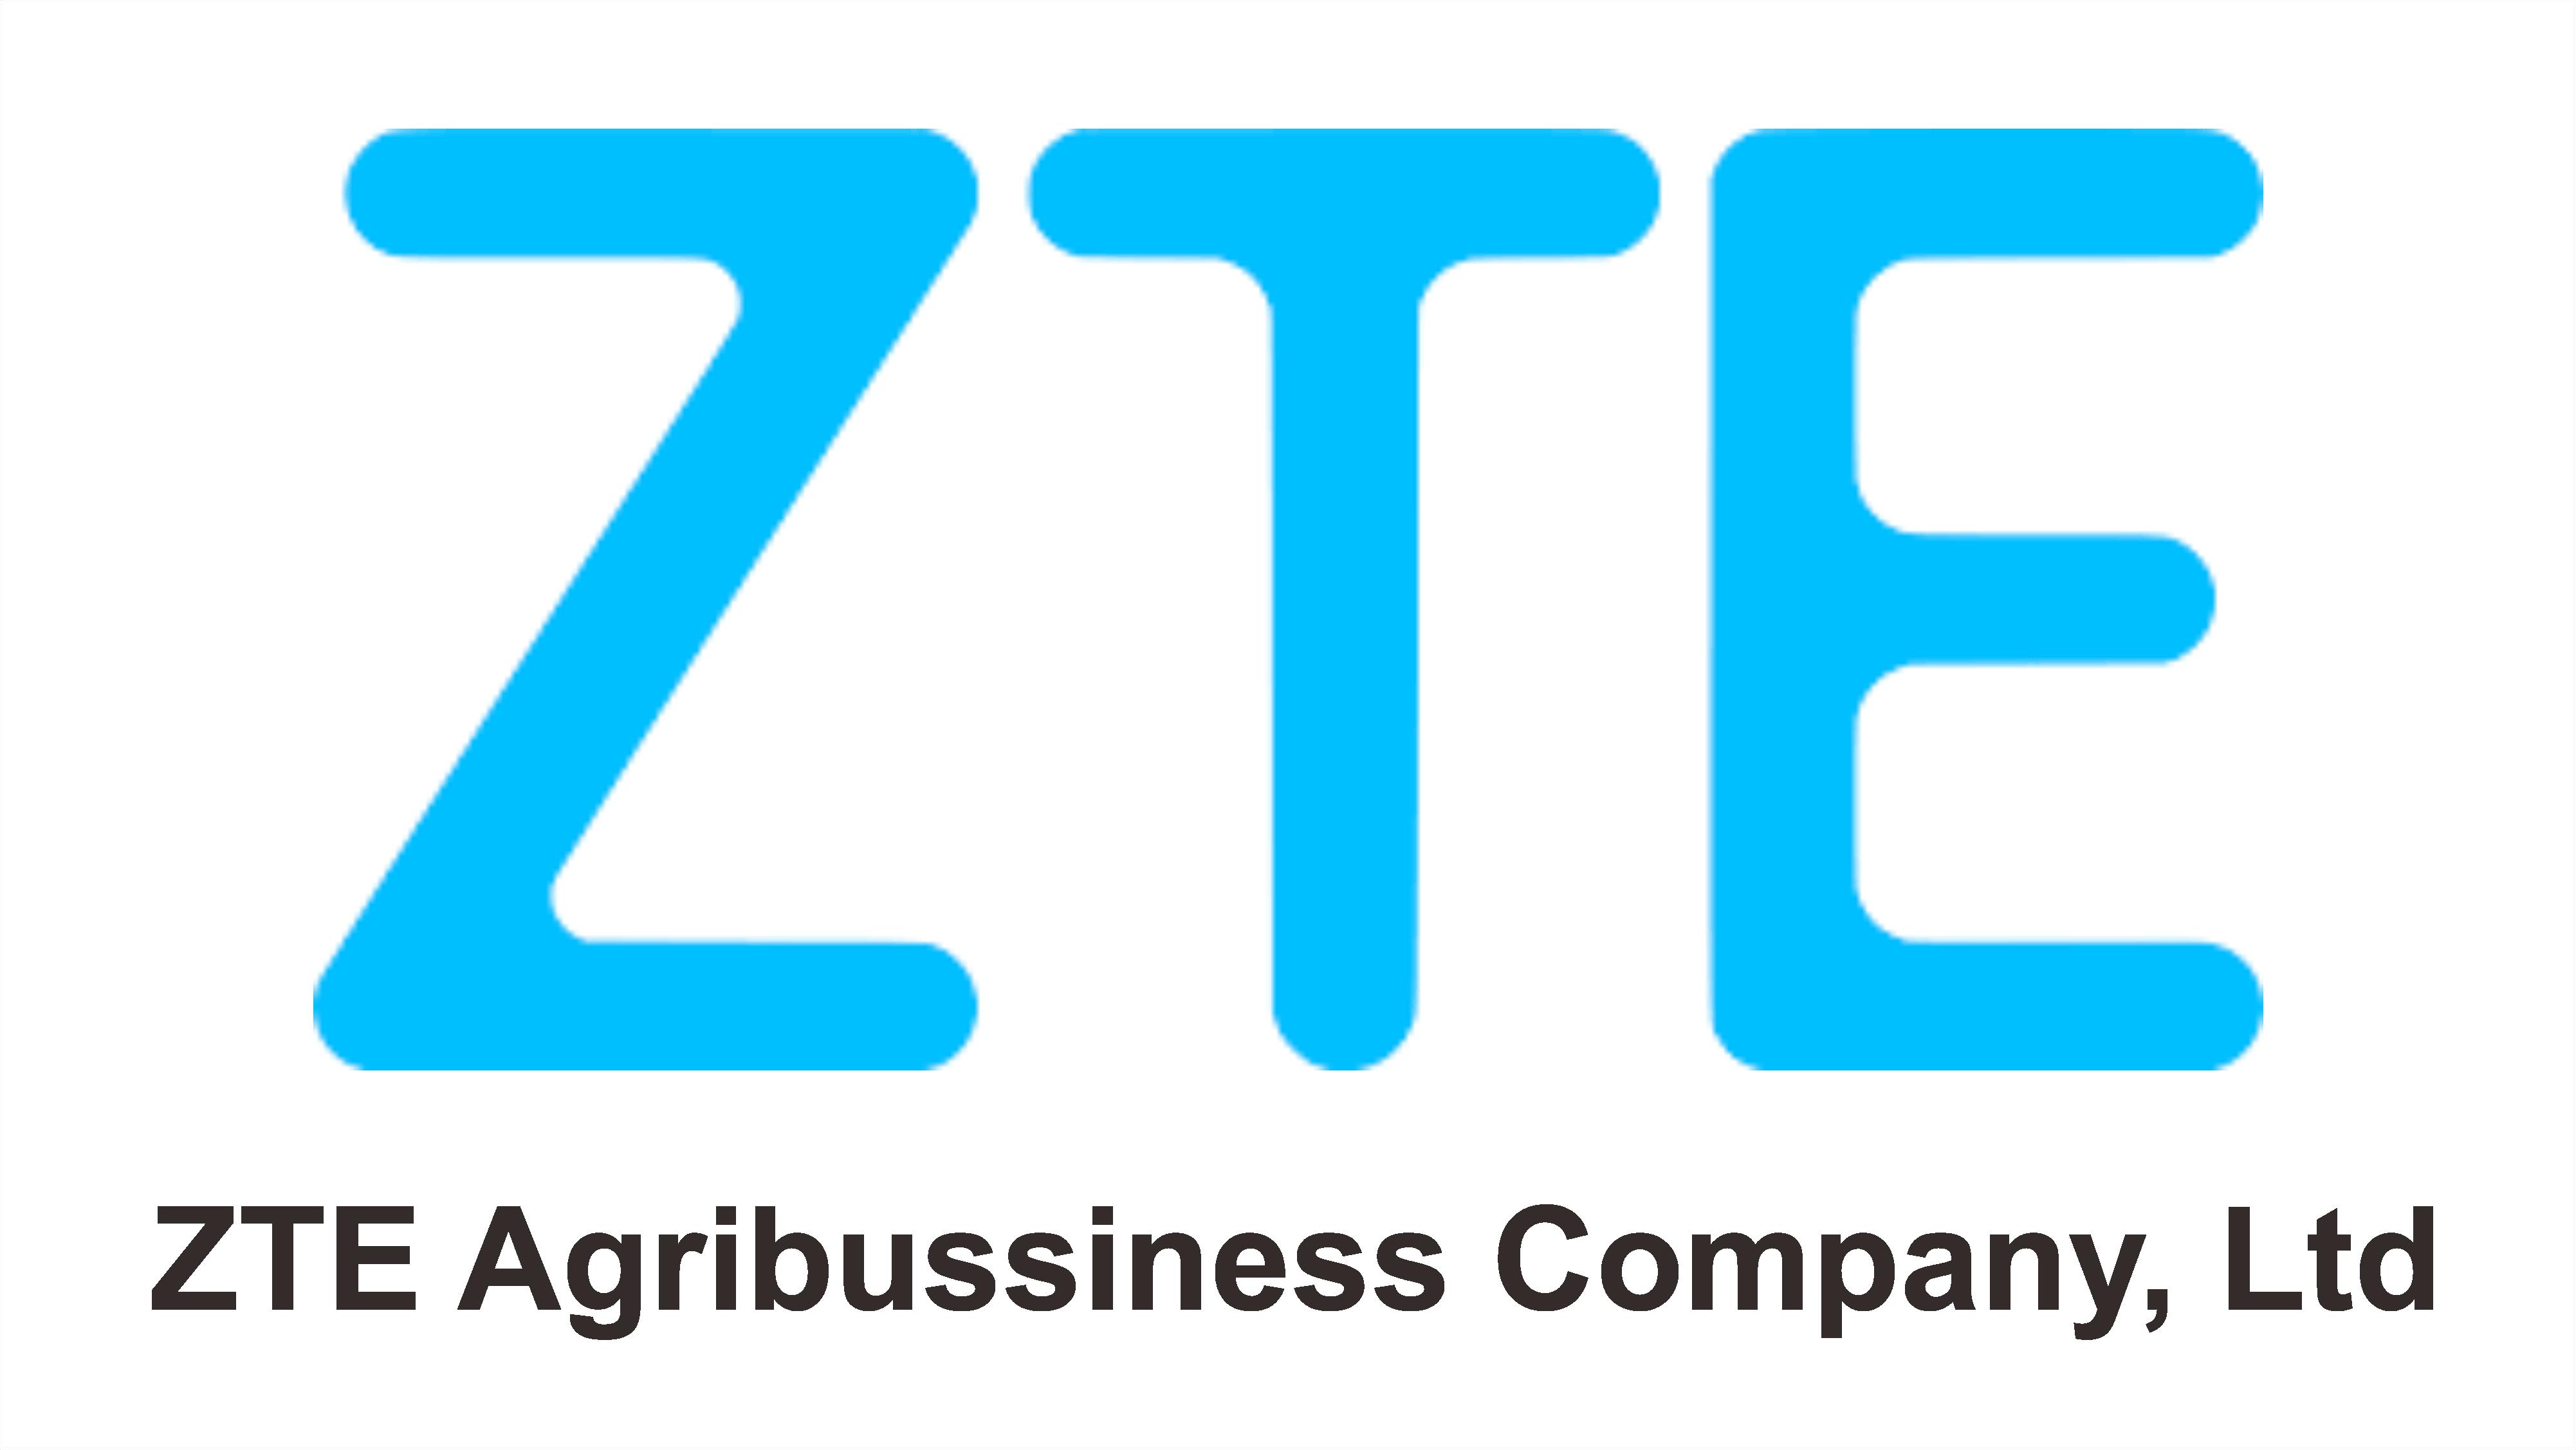 ZTE Agribussiness Company, Ltd